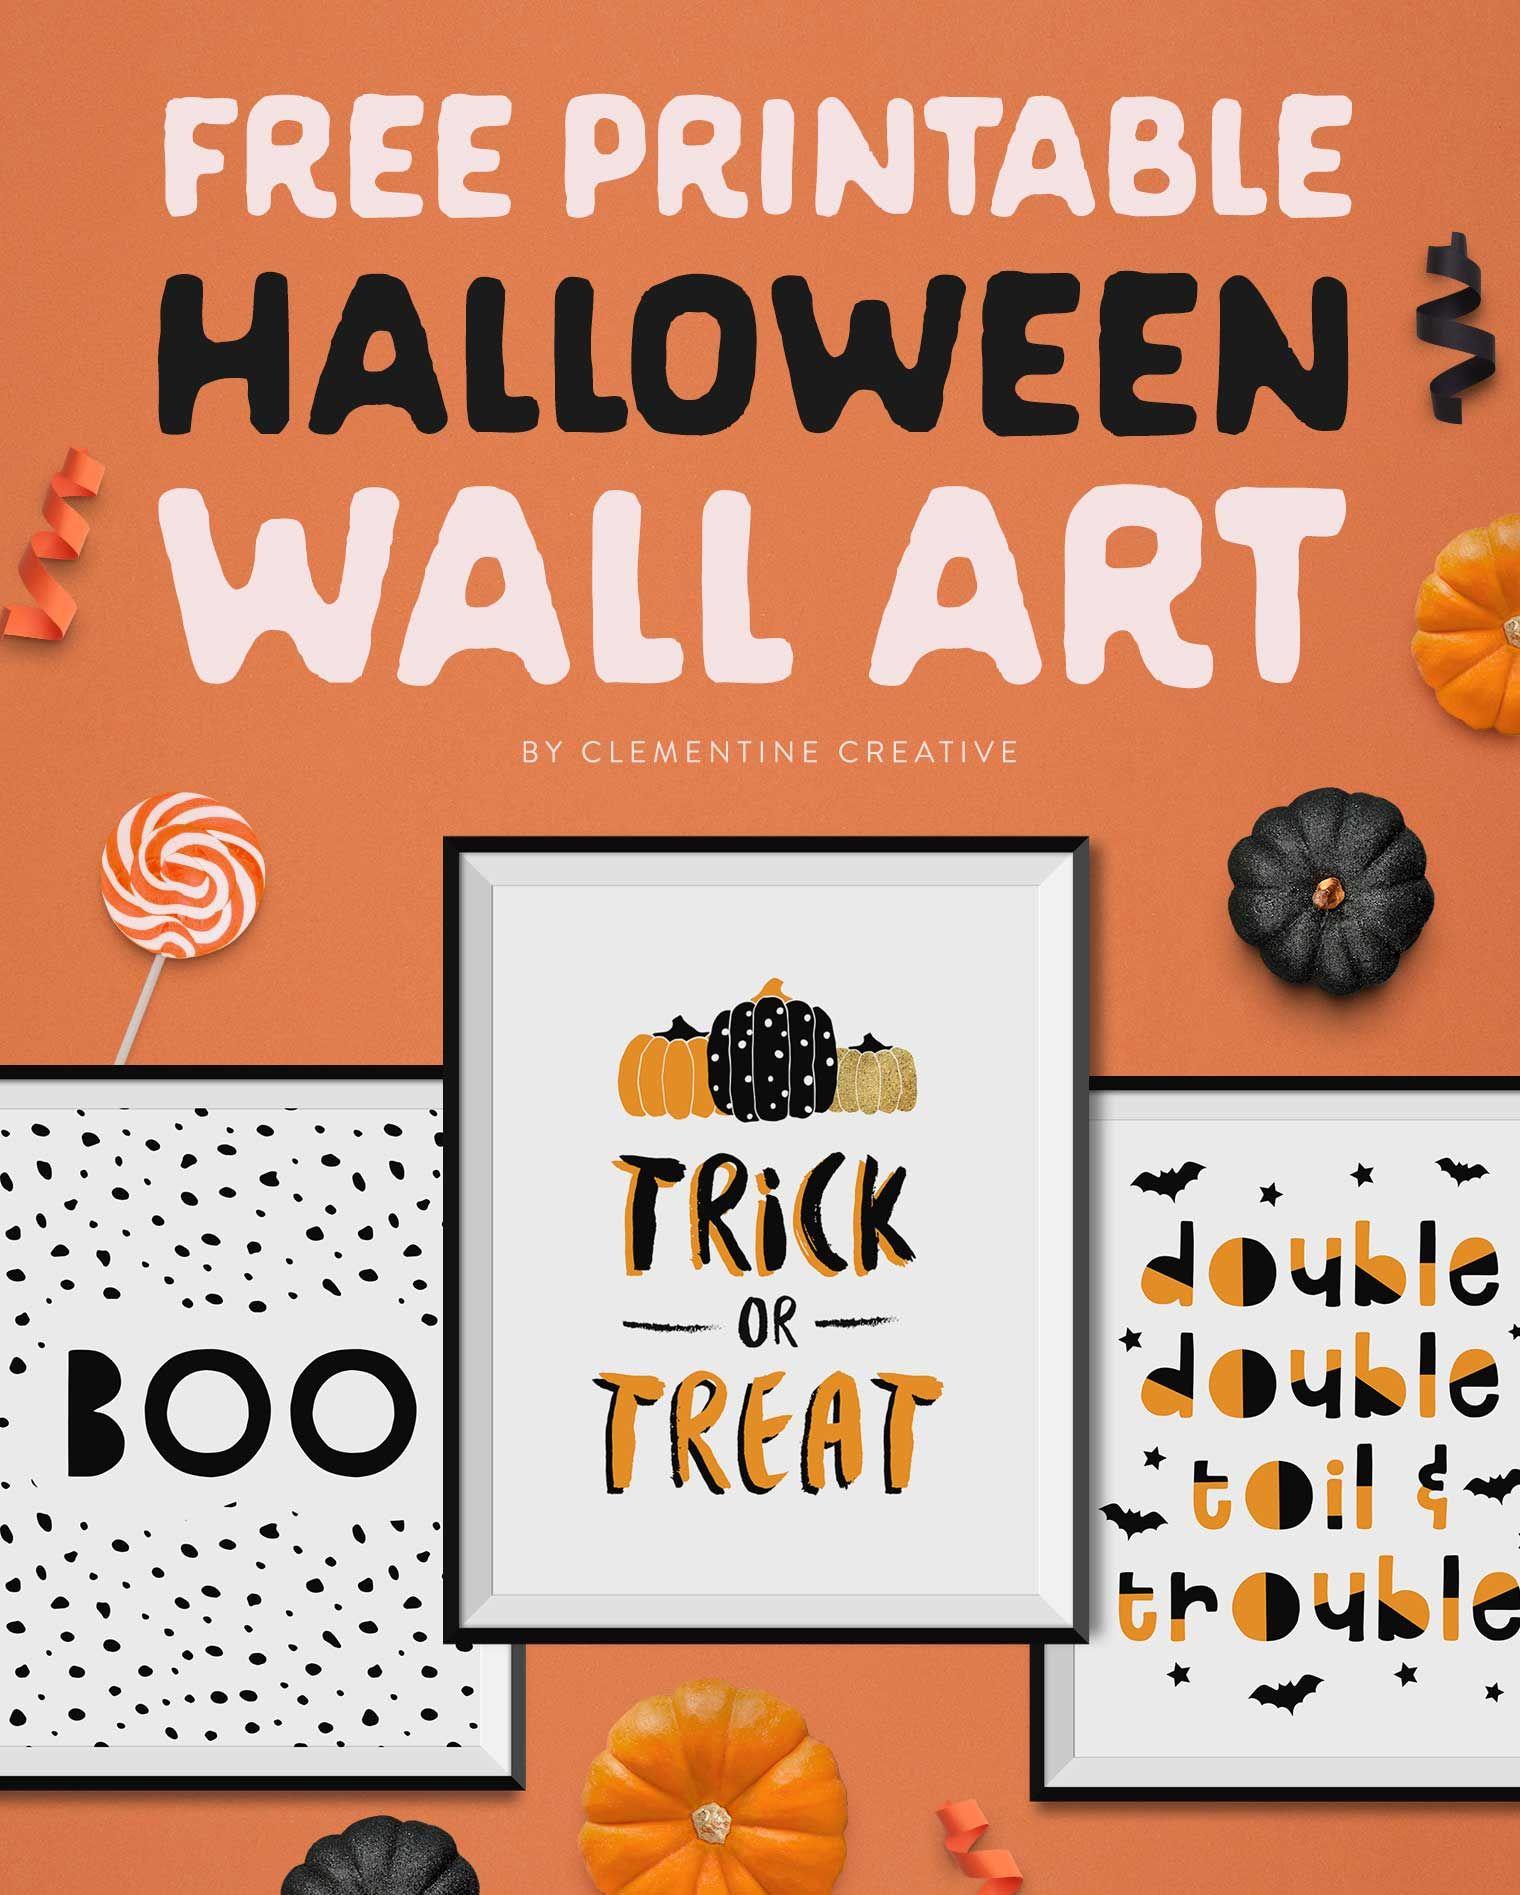 Free Printable Halloween Wall Art -Modern Prints For Your Halloween - Free Printable Halloween Party Decorations